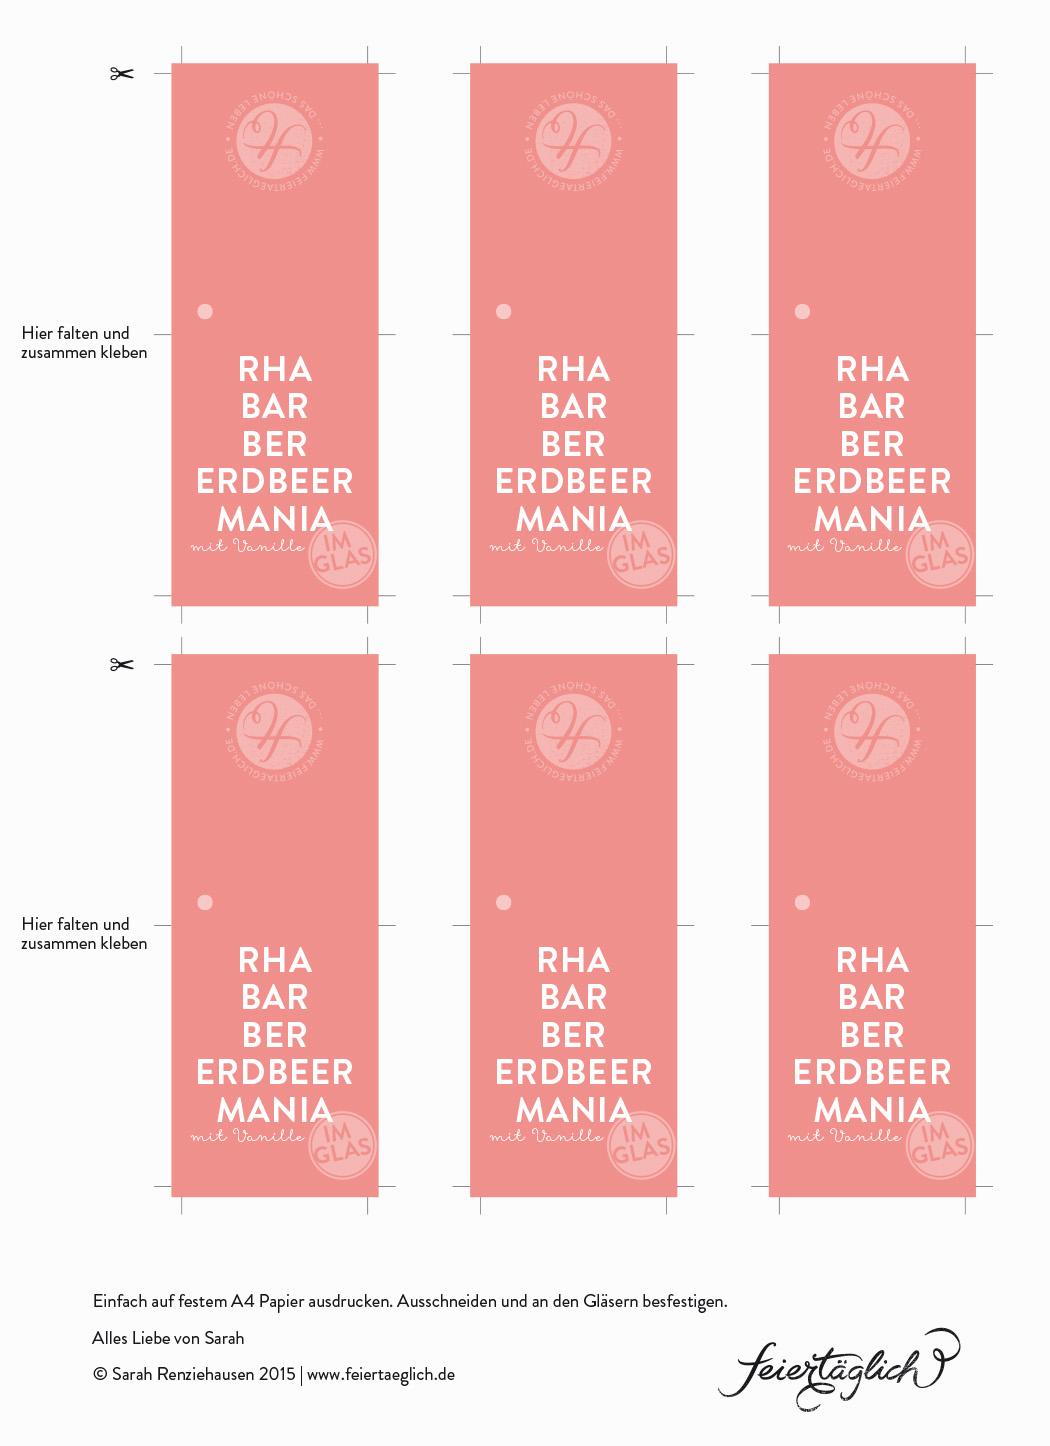 Rezept für Rhabarber-Erdbeer-Vanille Marmelade, Free Printable Labels, DIY #freeprintables #RhaBarBerMania #feiertaeglich